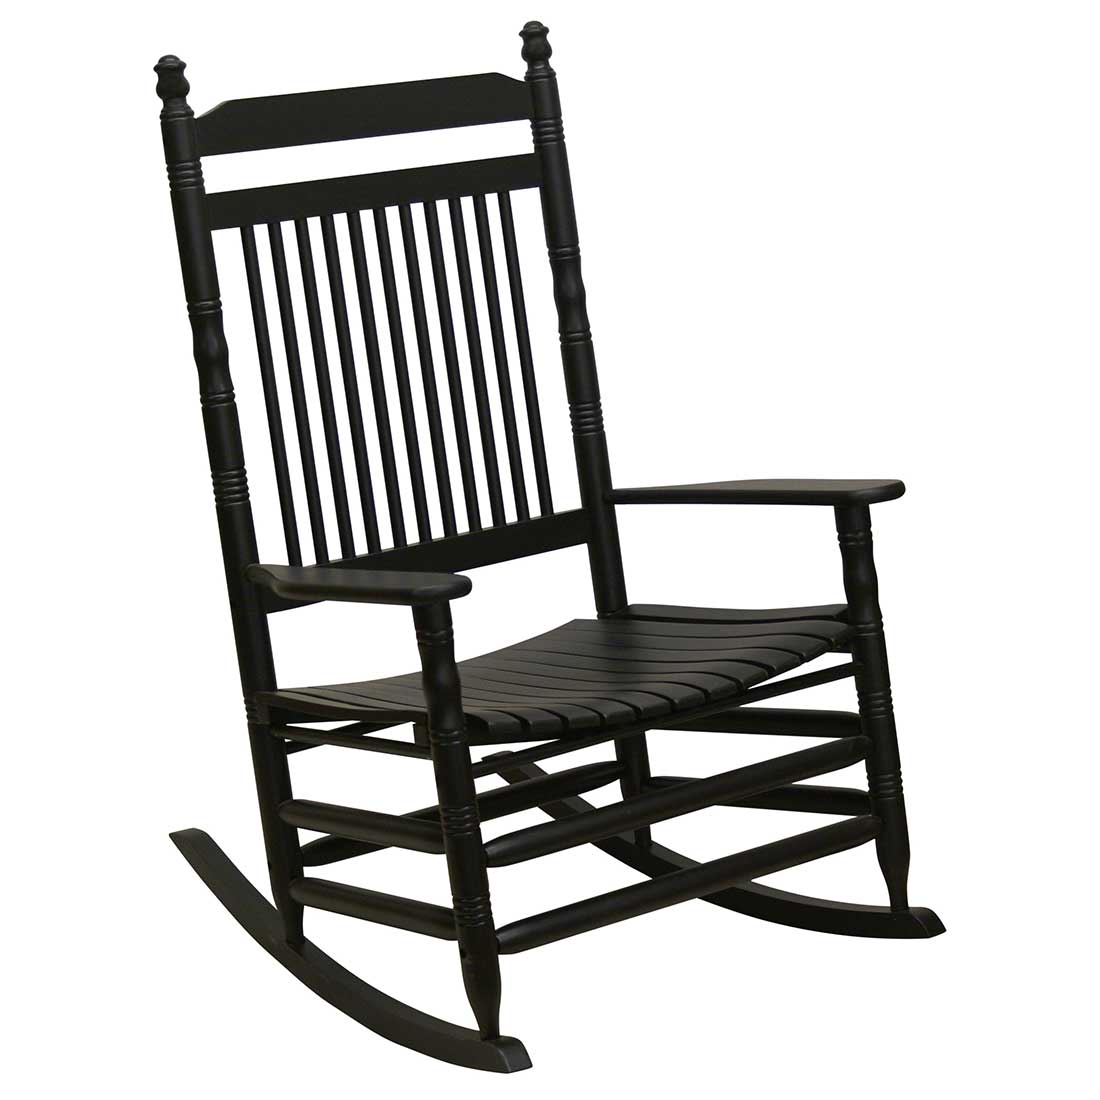 Shop.crackerbarrel.com: Jumbo Slat Rocking Chair   Black   Cracker Barrel  Old Country Store